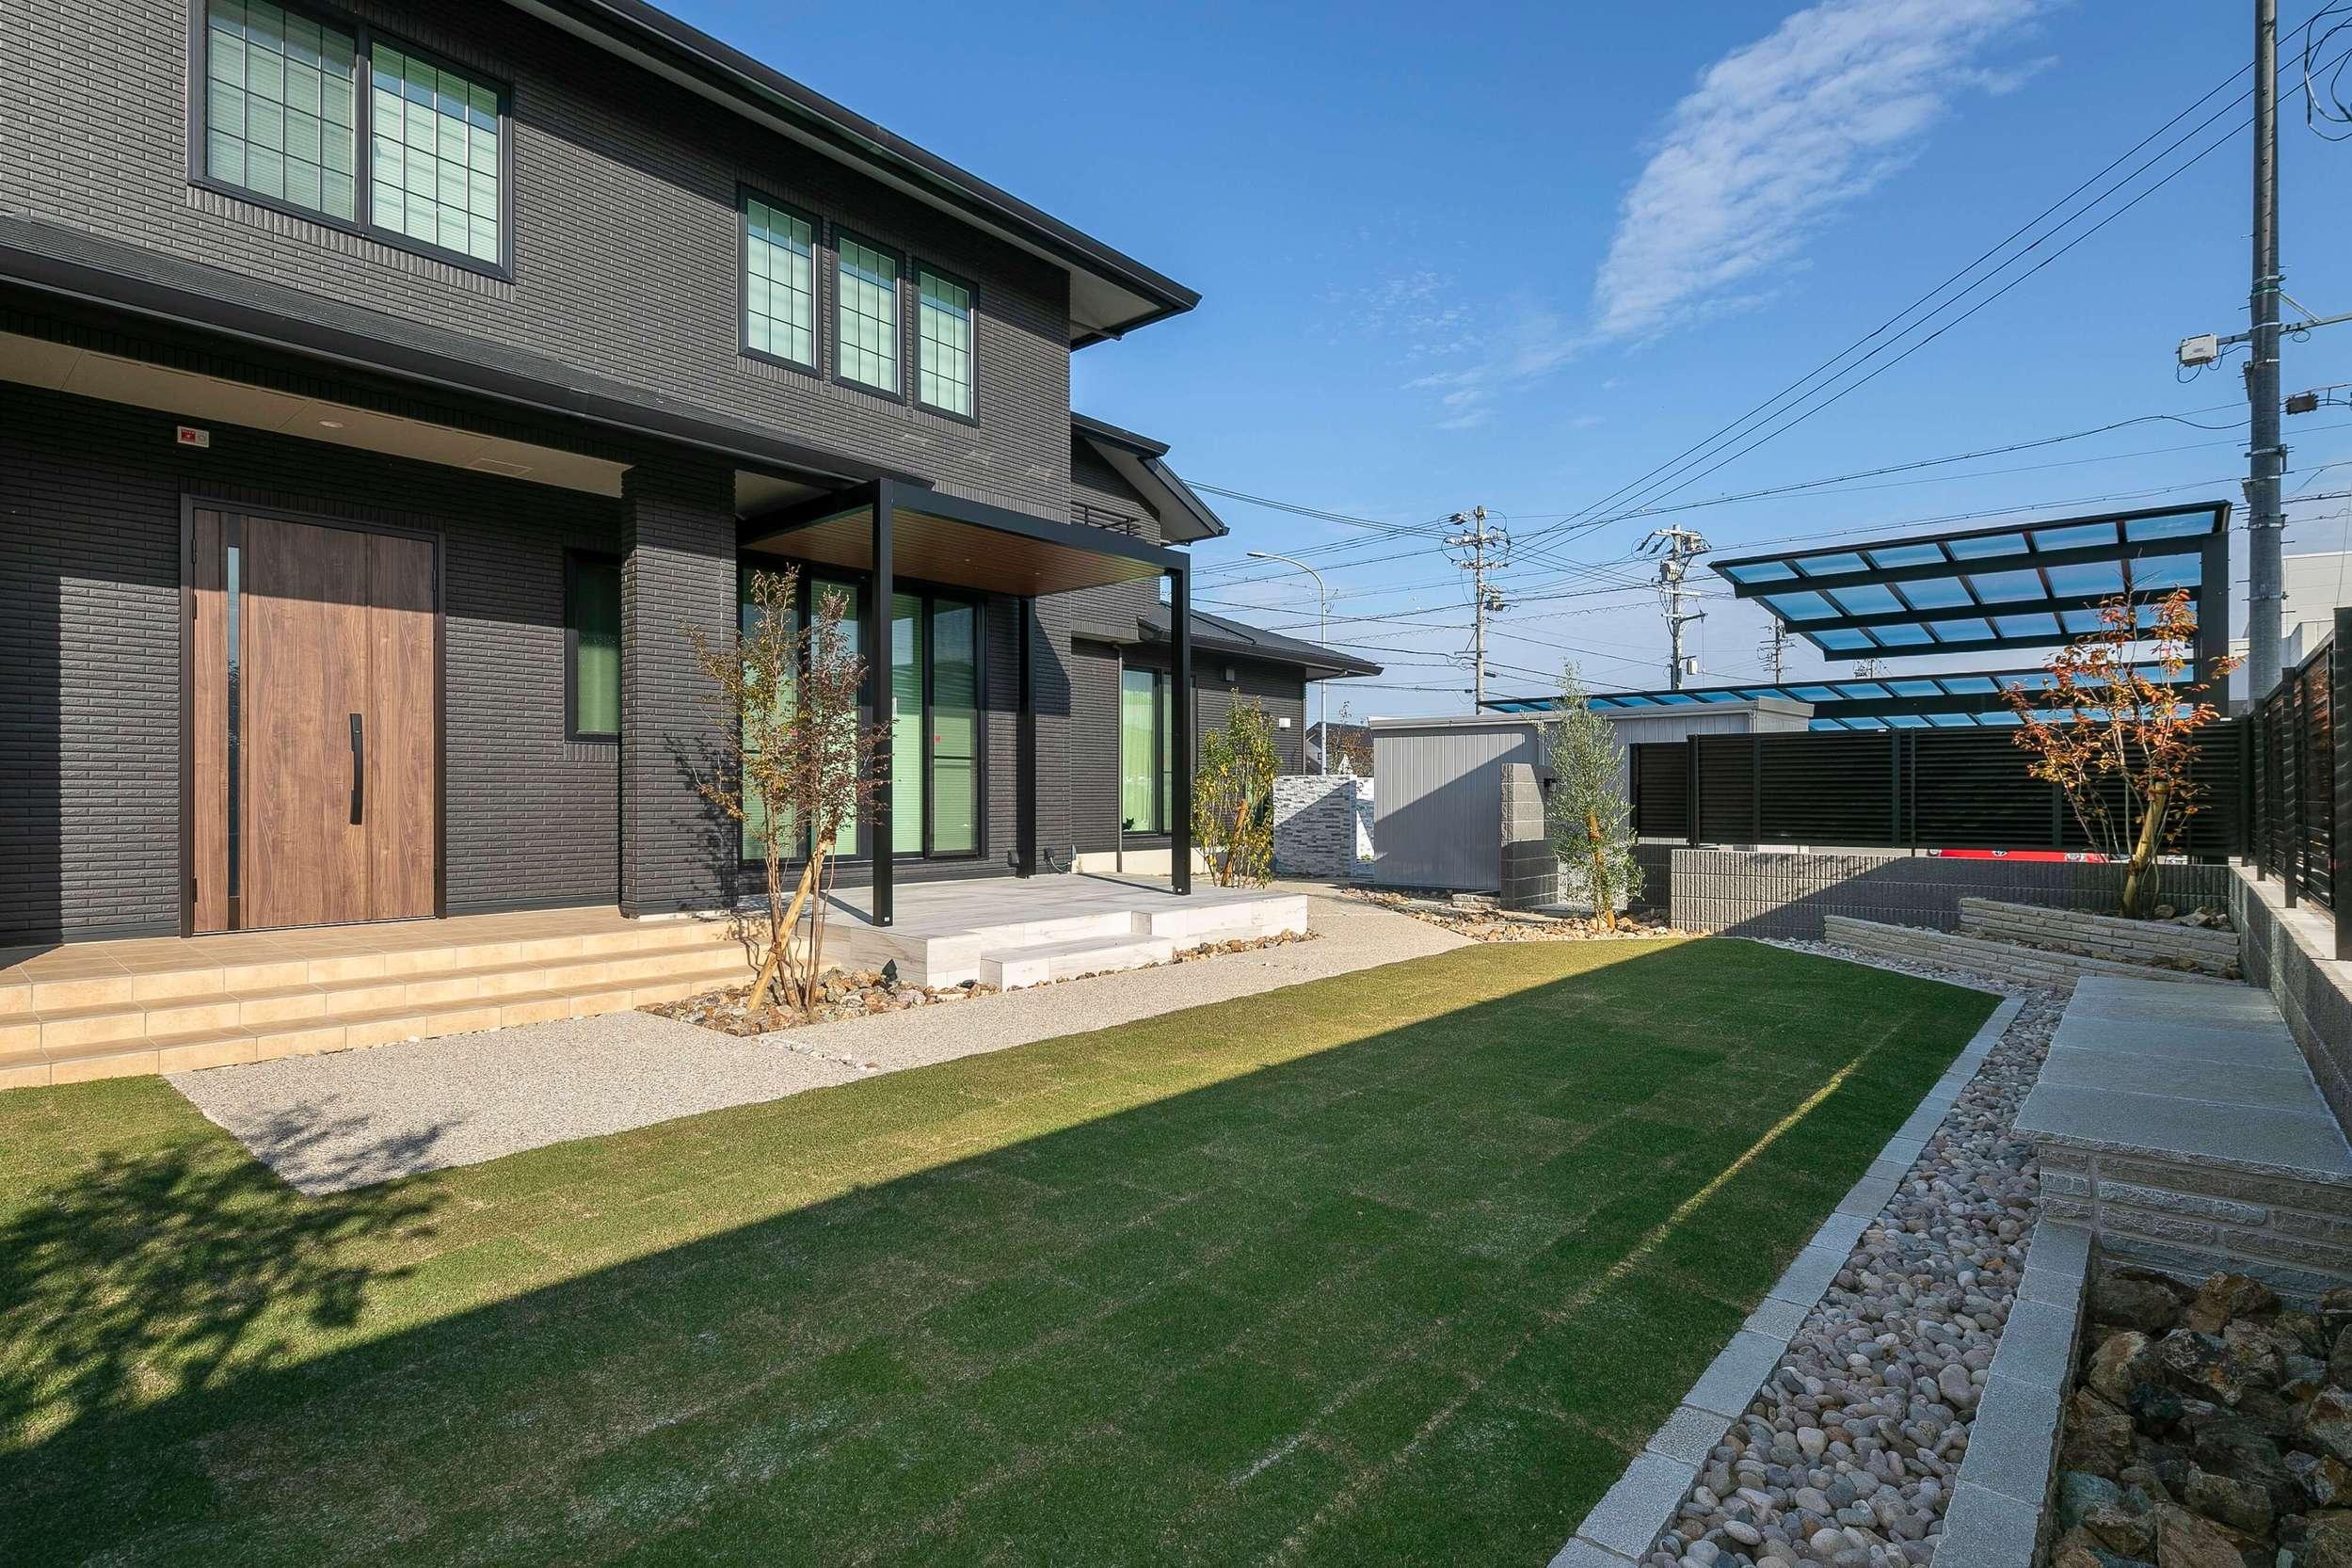 二世帯住宅 庭 ガーデン 芝生 自然石